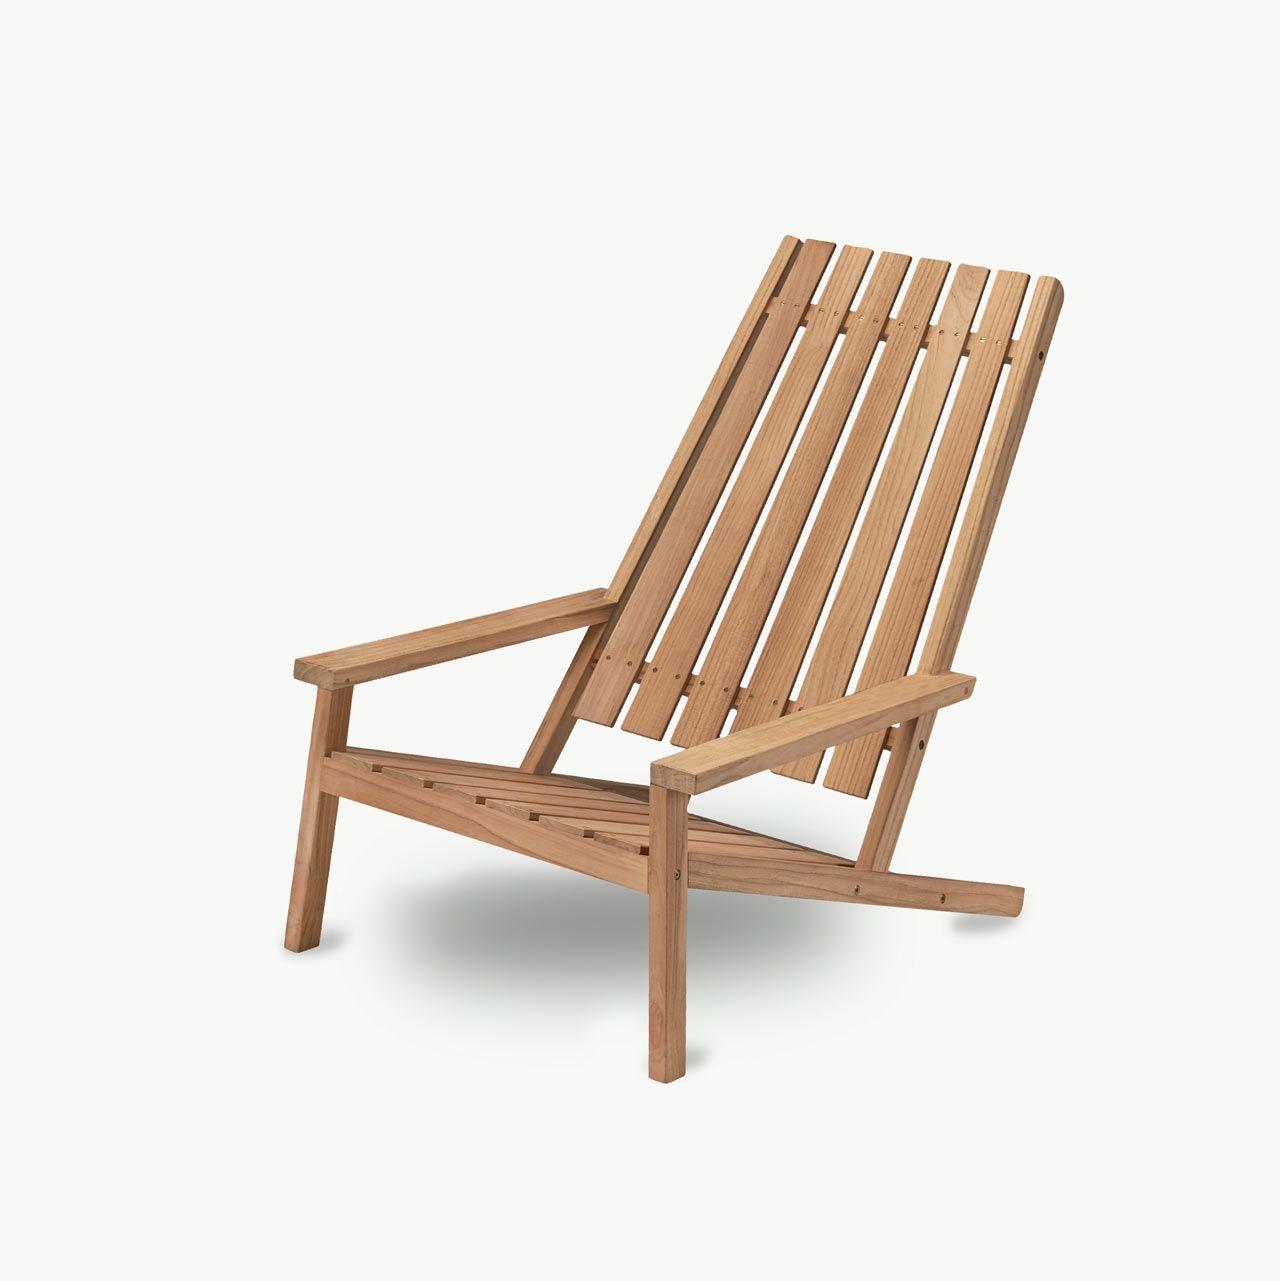 New Wooden Outdoor Furniture from Skagerak | Sillas